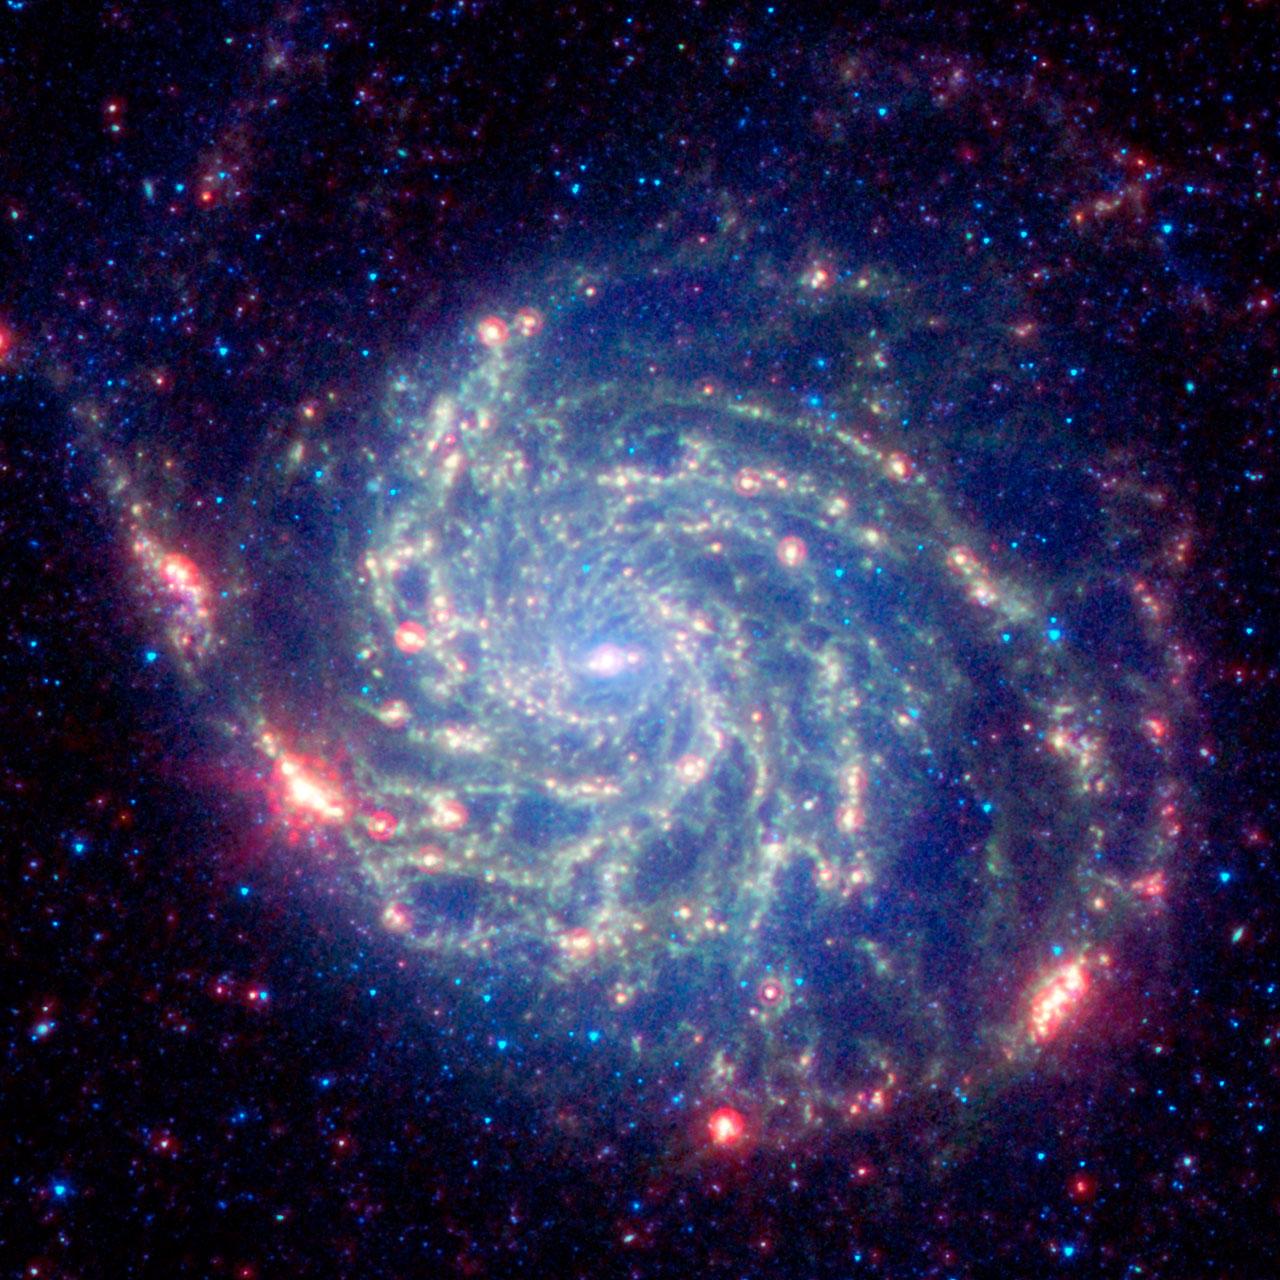 Spitzer image of M101